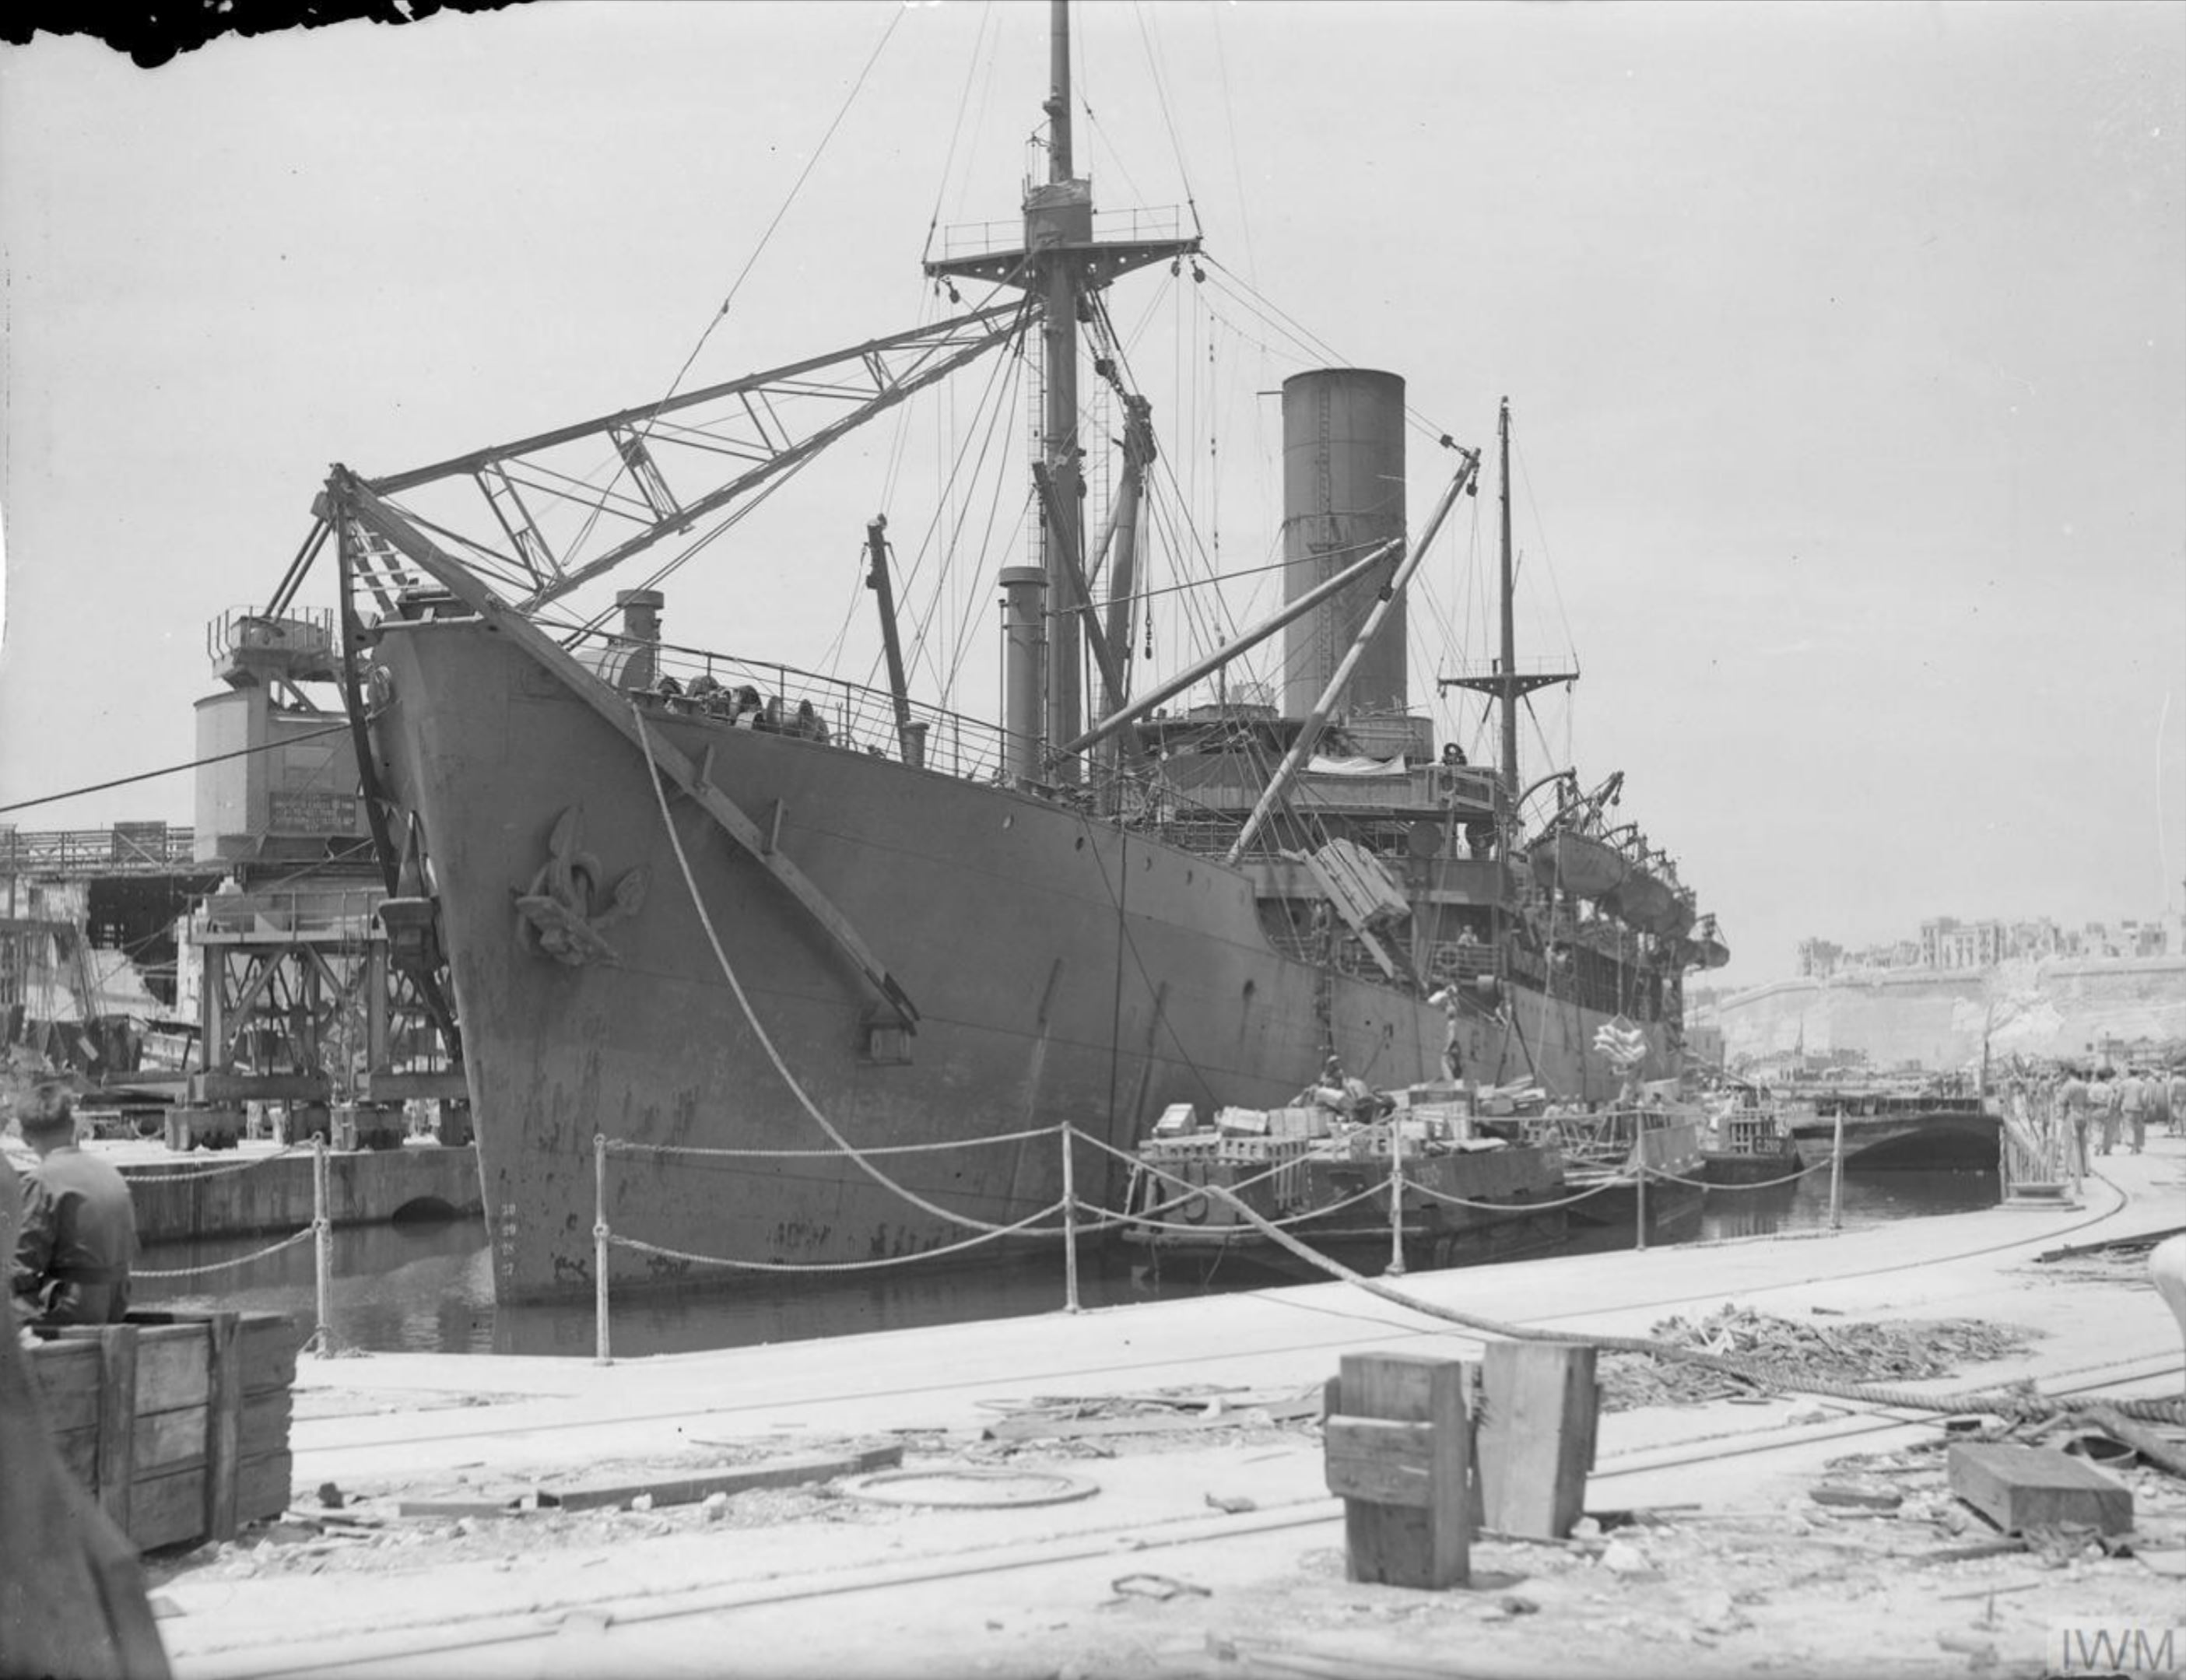 Merchant ship Troilus freight being emptied in Grand Harbour Malta 16th Jun 1942 IWM A10408